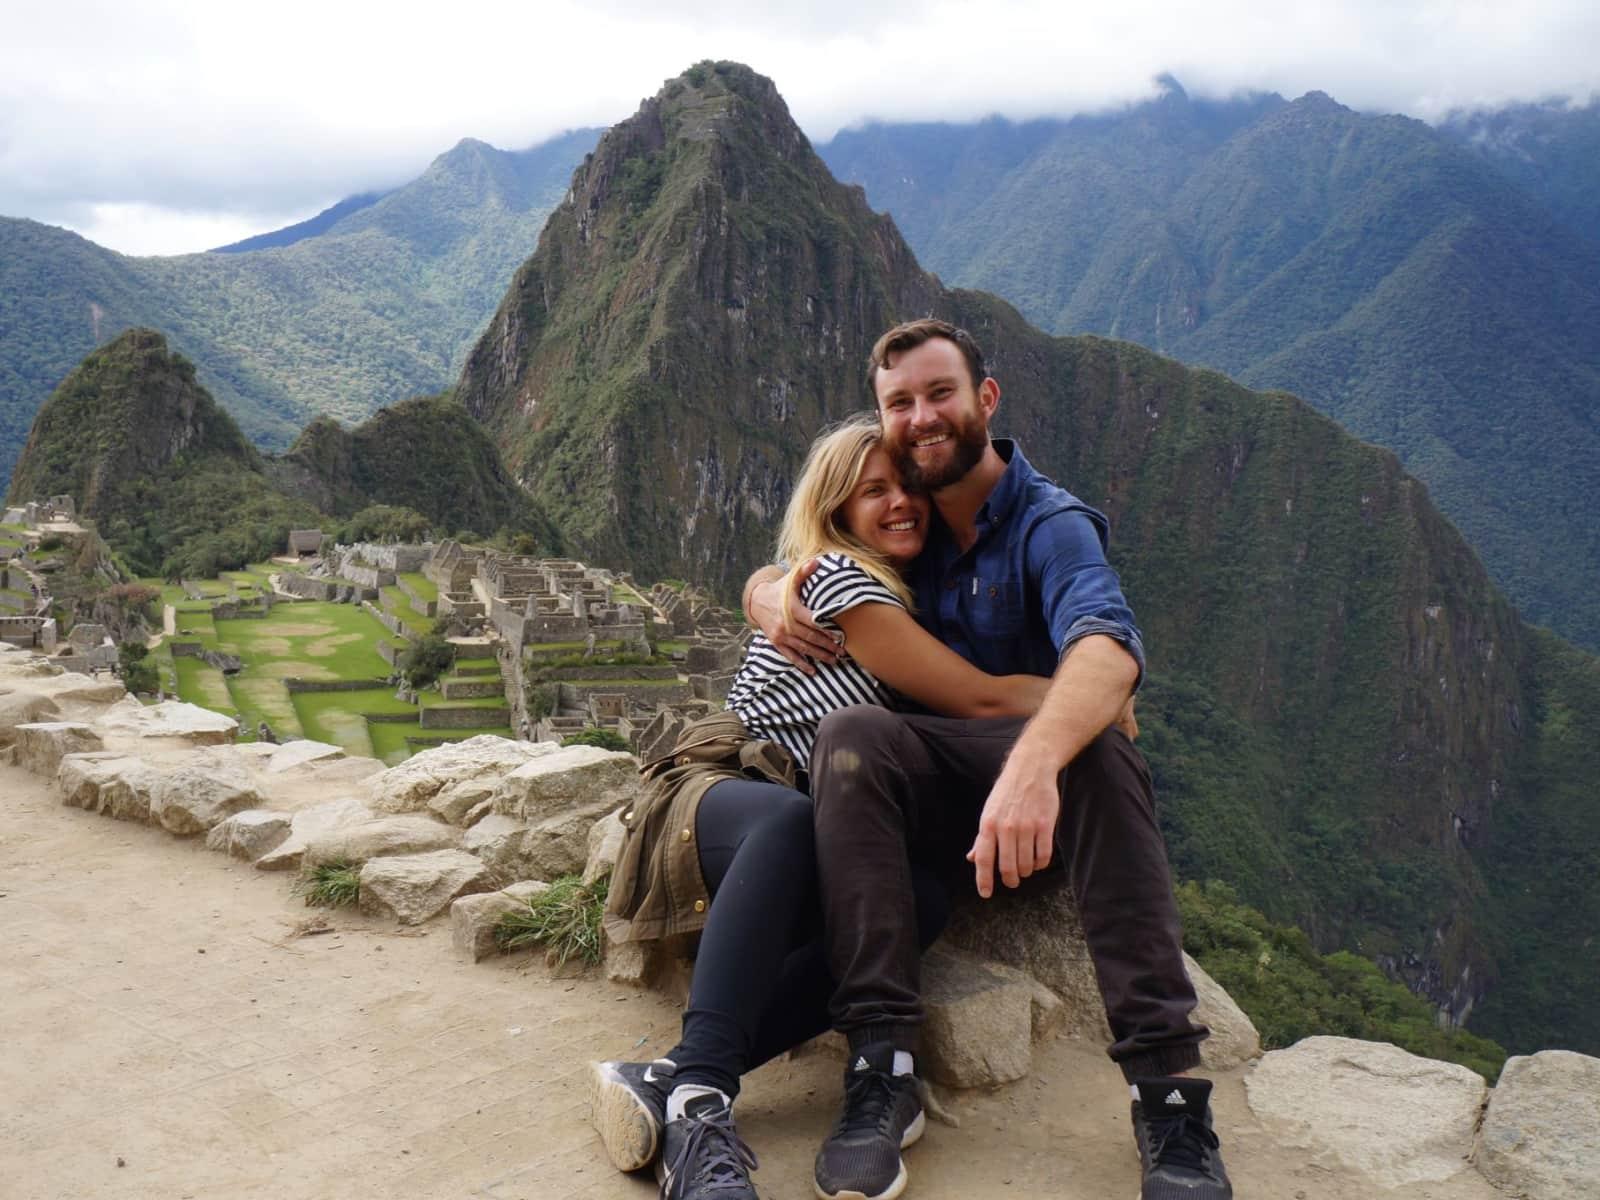 Erin & Sam from New York City, New York, United States